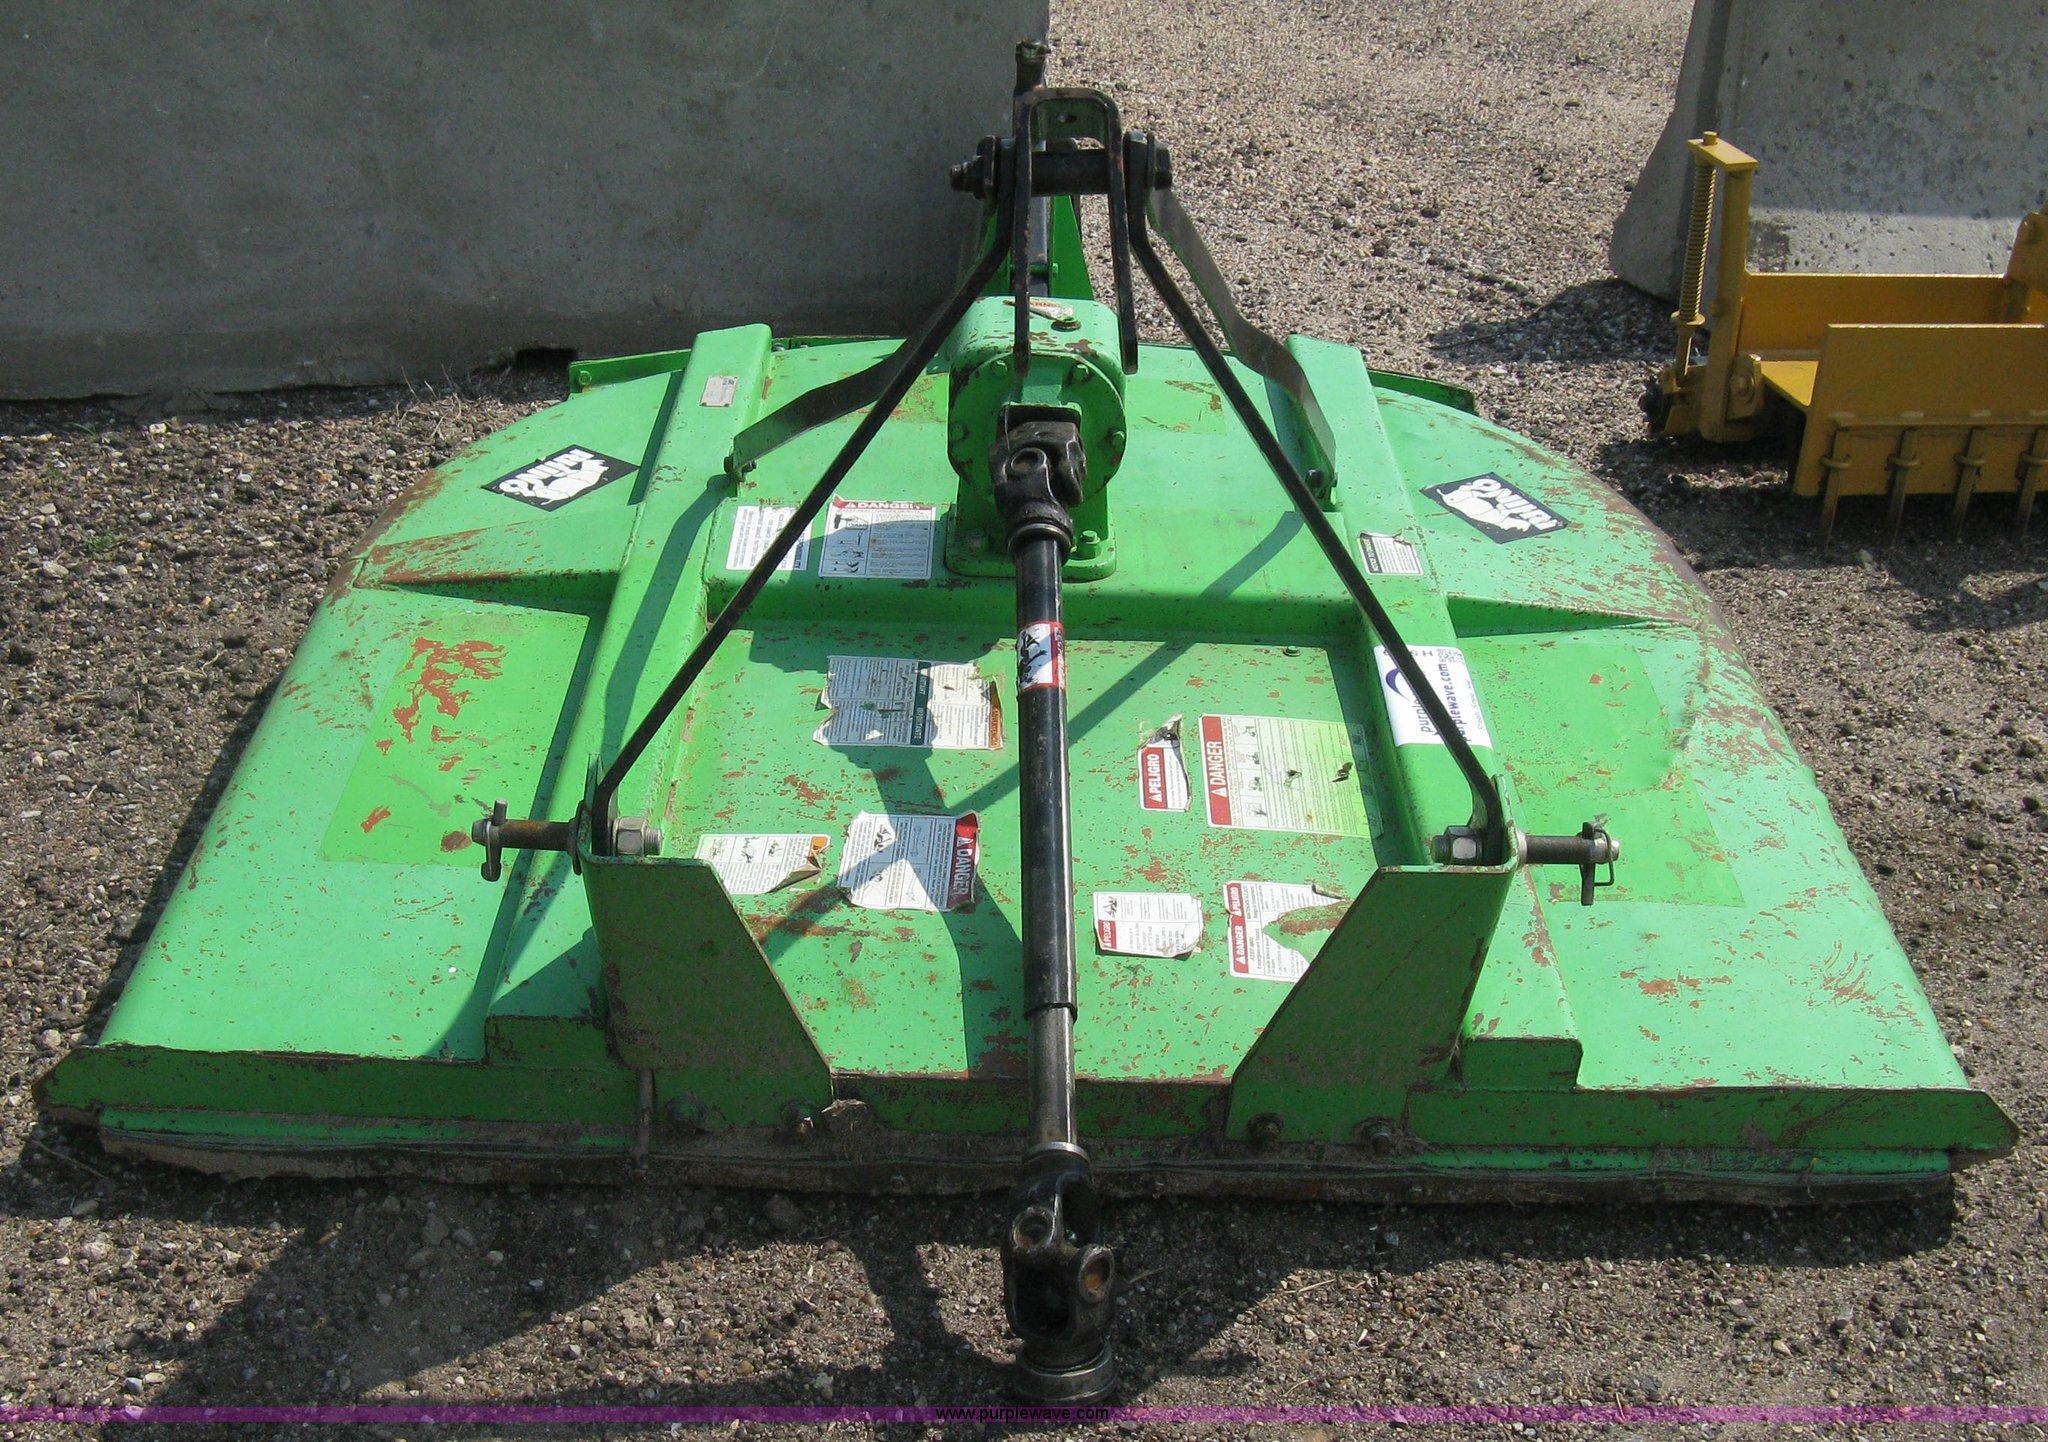 Rhino SE5 rotary mower | Item H5319 | SOLD! August 20 Vehicl